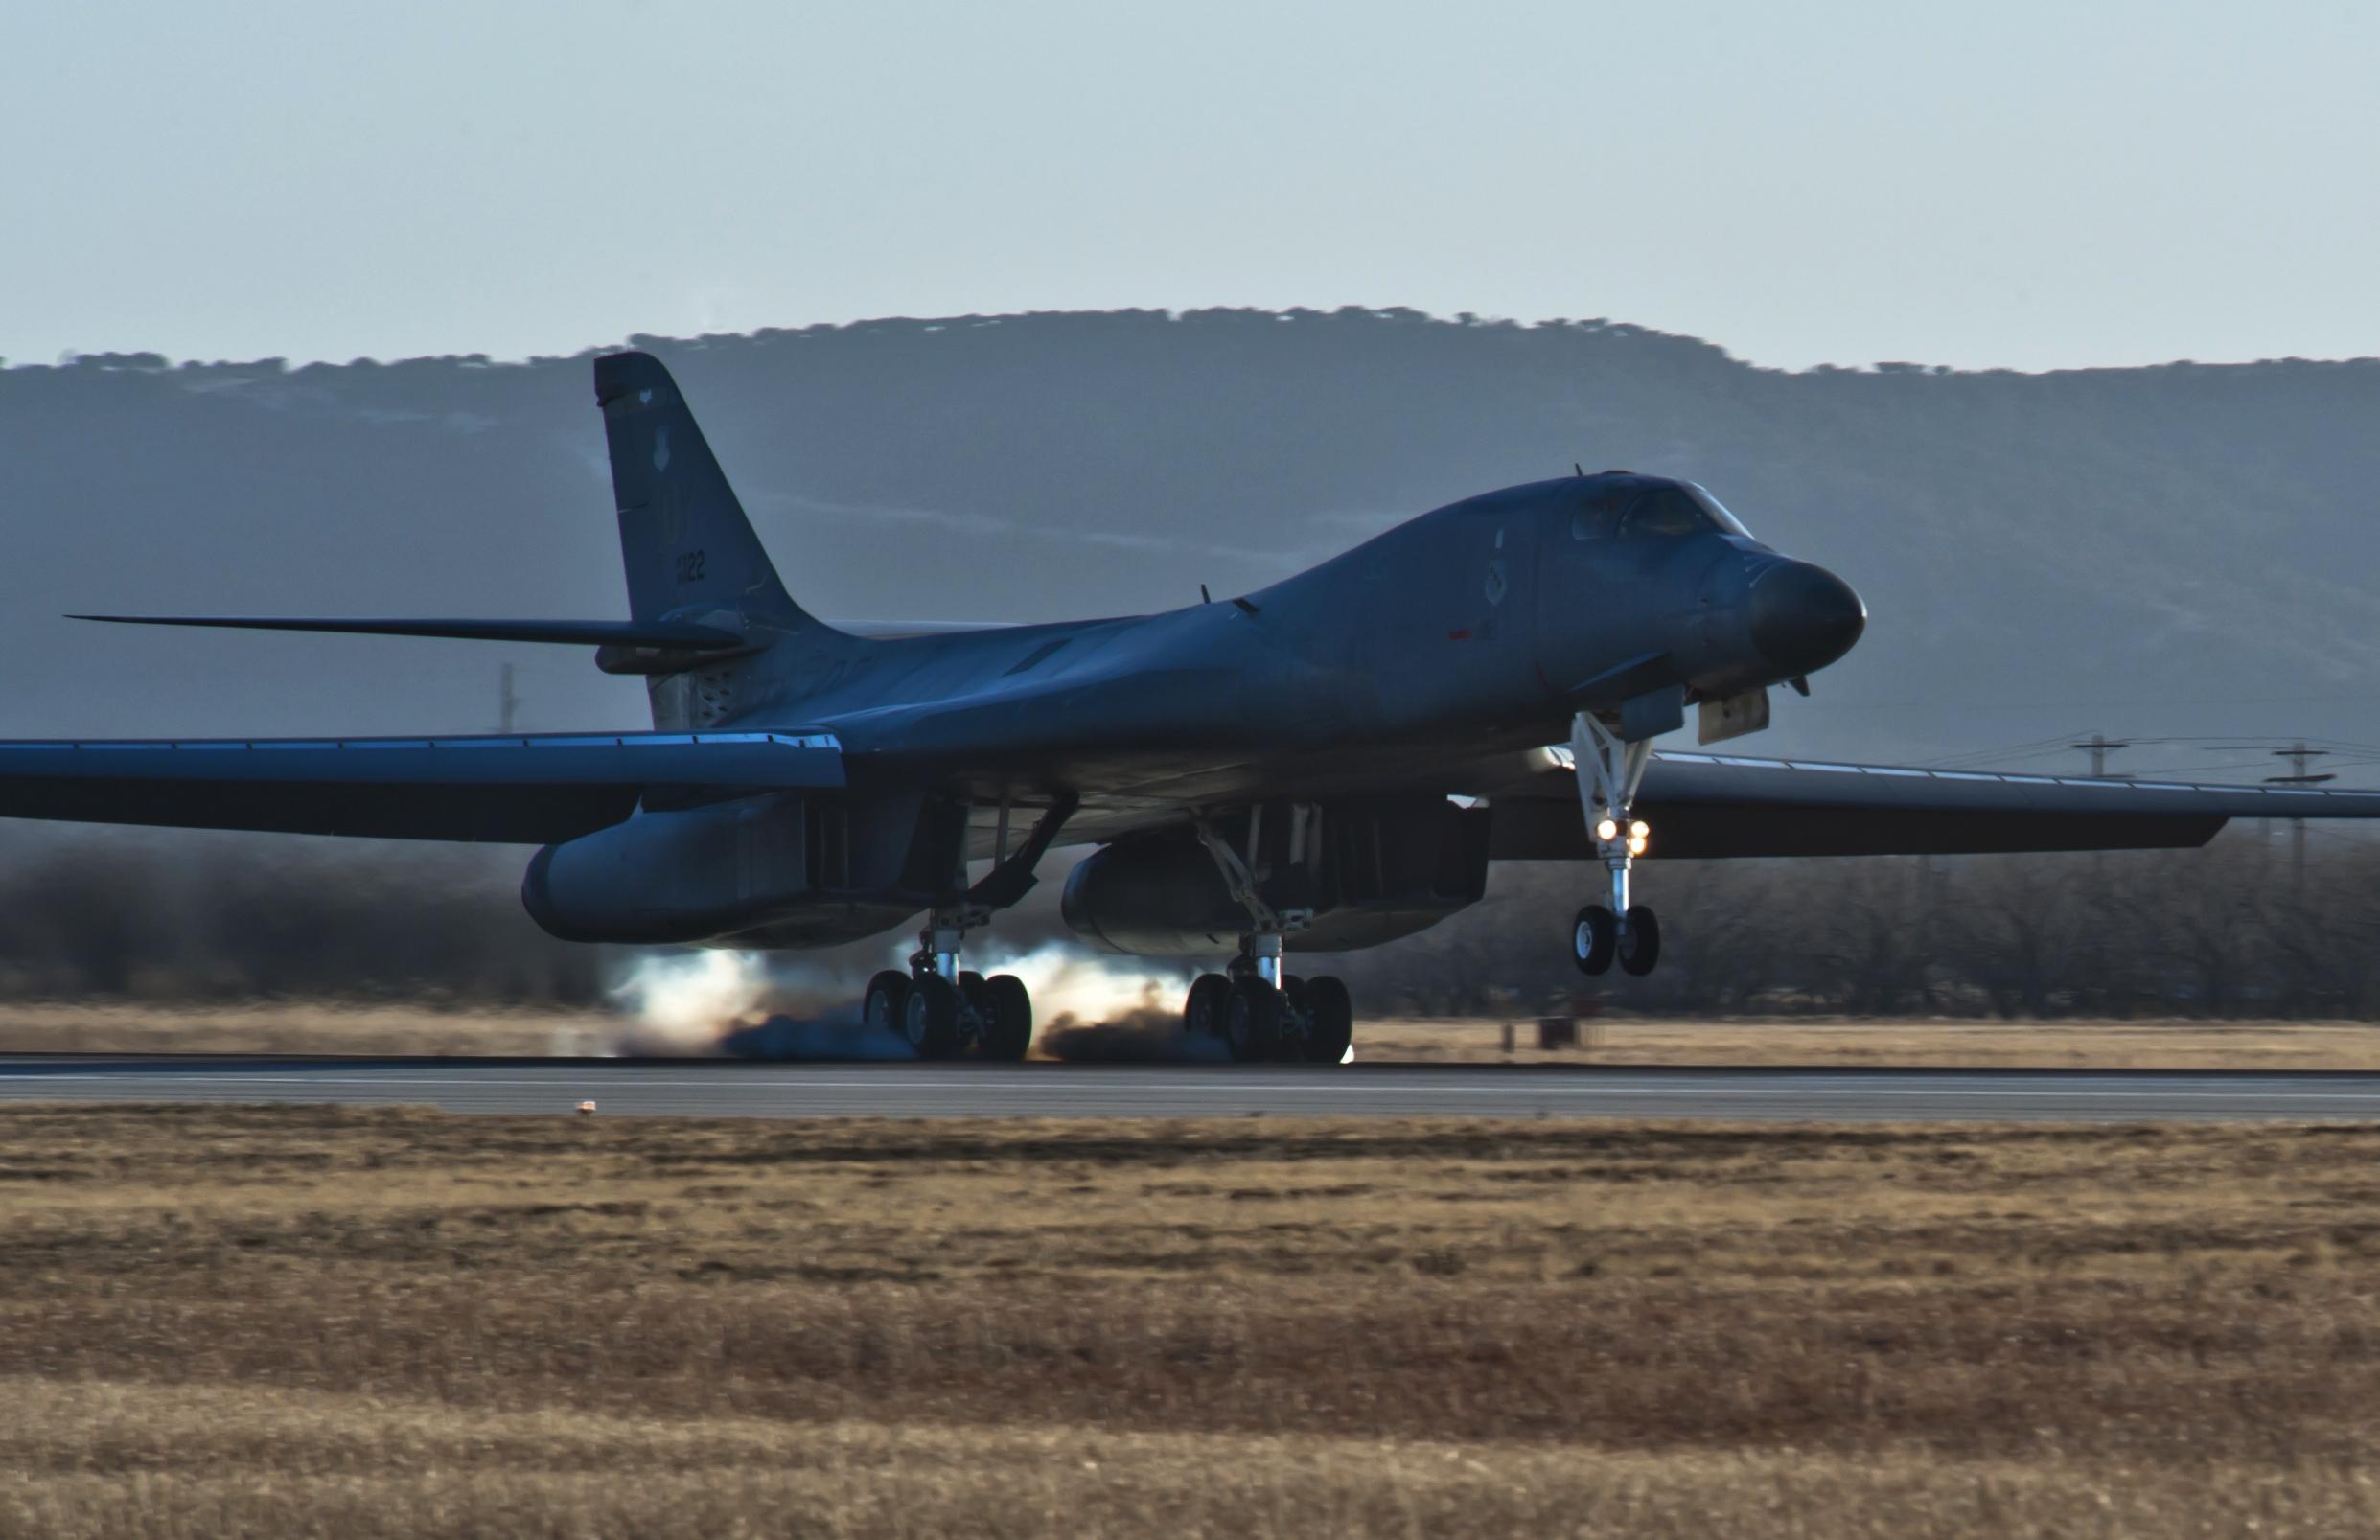 B 1 (航空機)の画像 p1_40